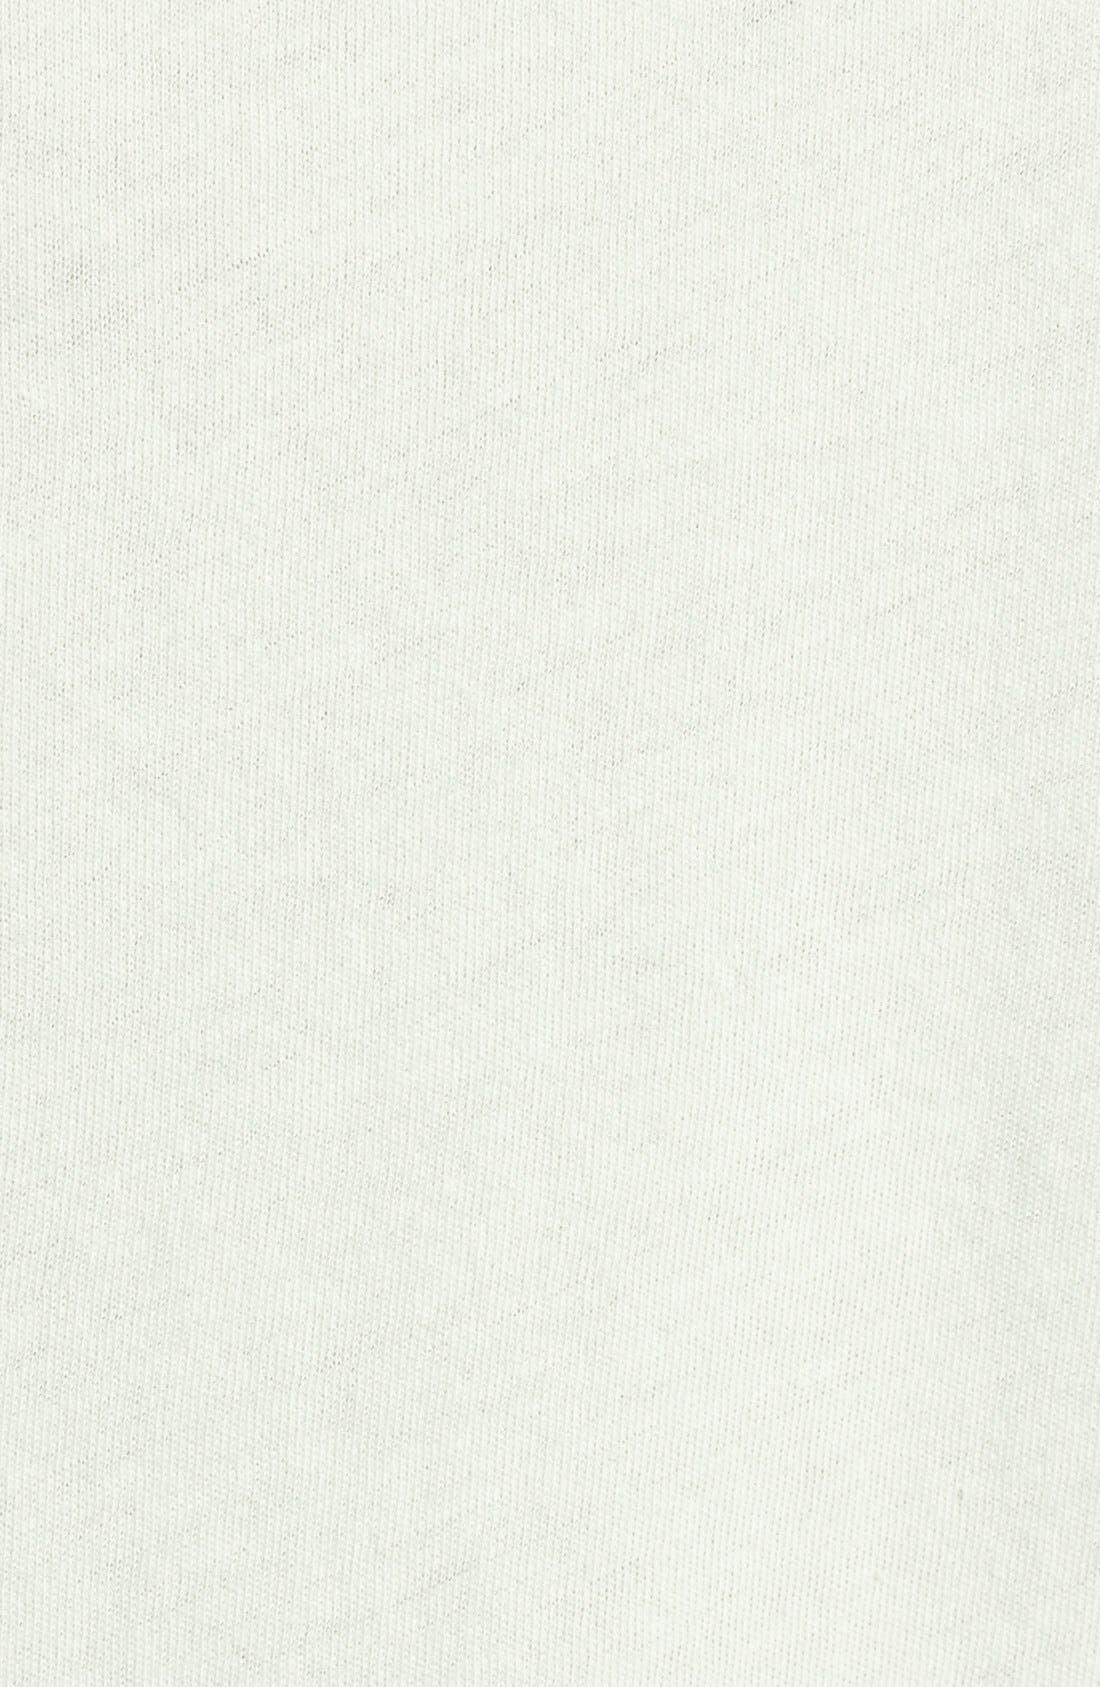 Alternate Image 3  - Wildfox 'Island List' Graphic Print Cotton Tee